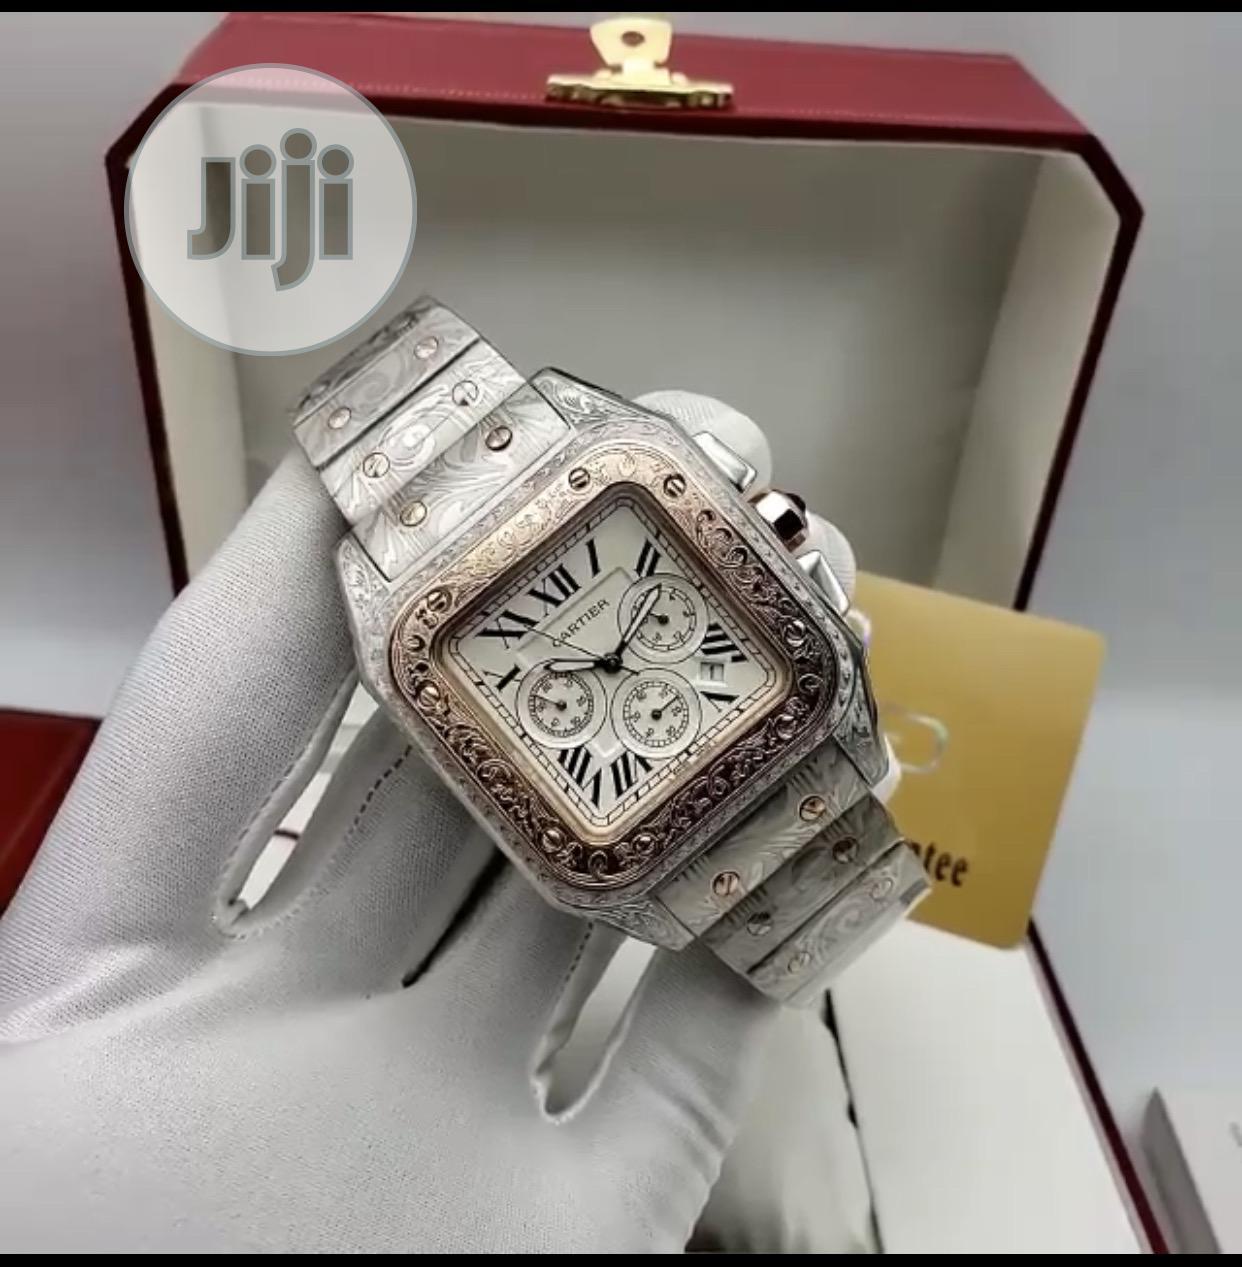 Premium Cartier Watch